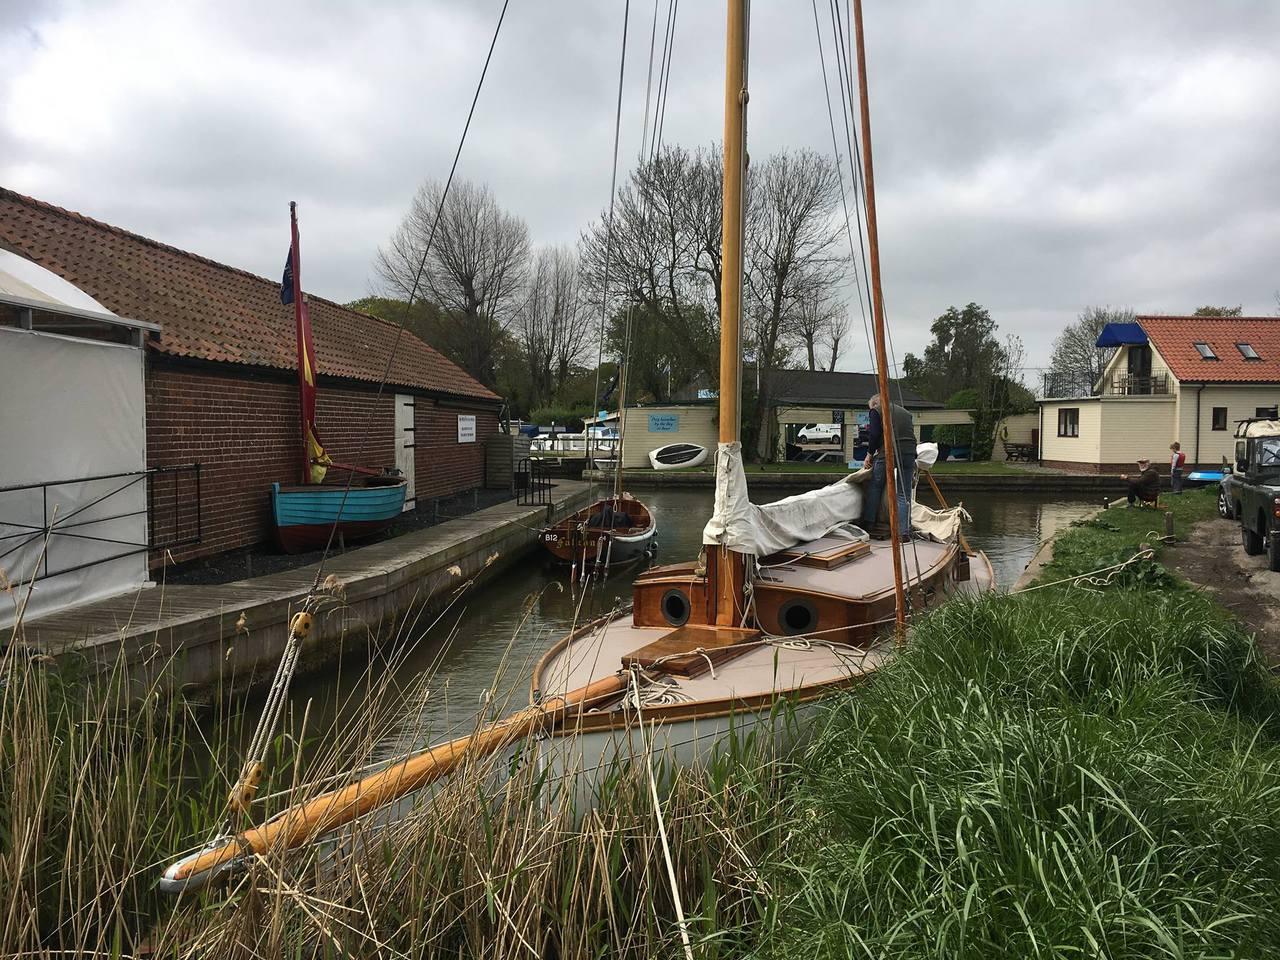 Simpson S Boatyard2